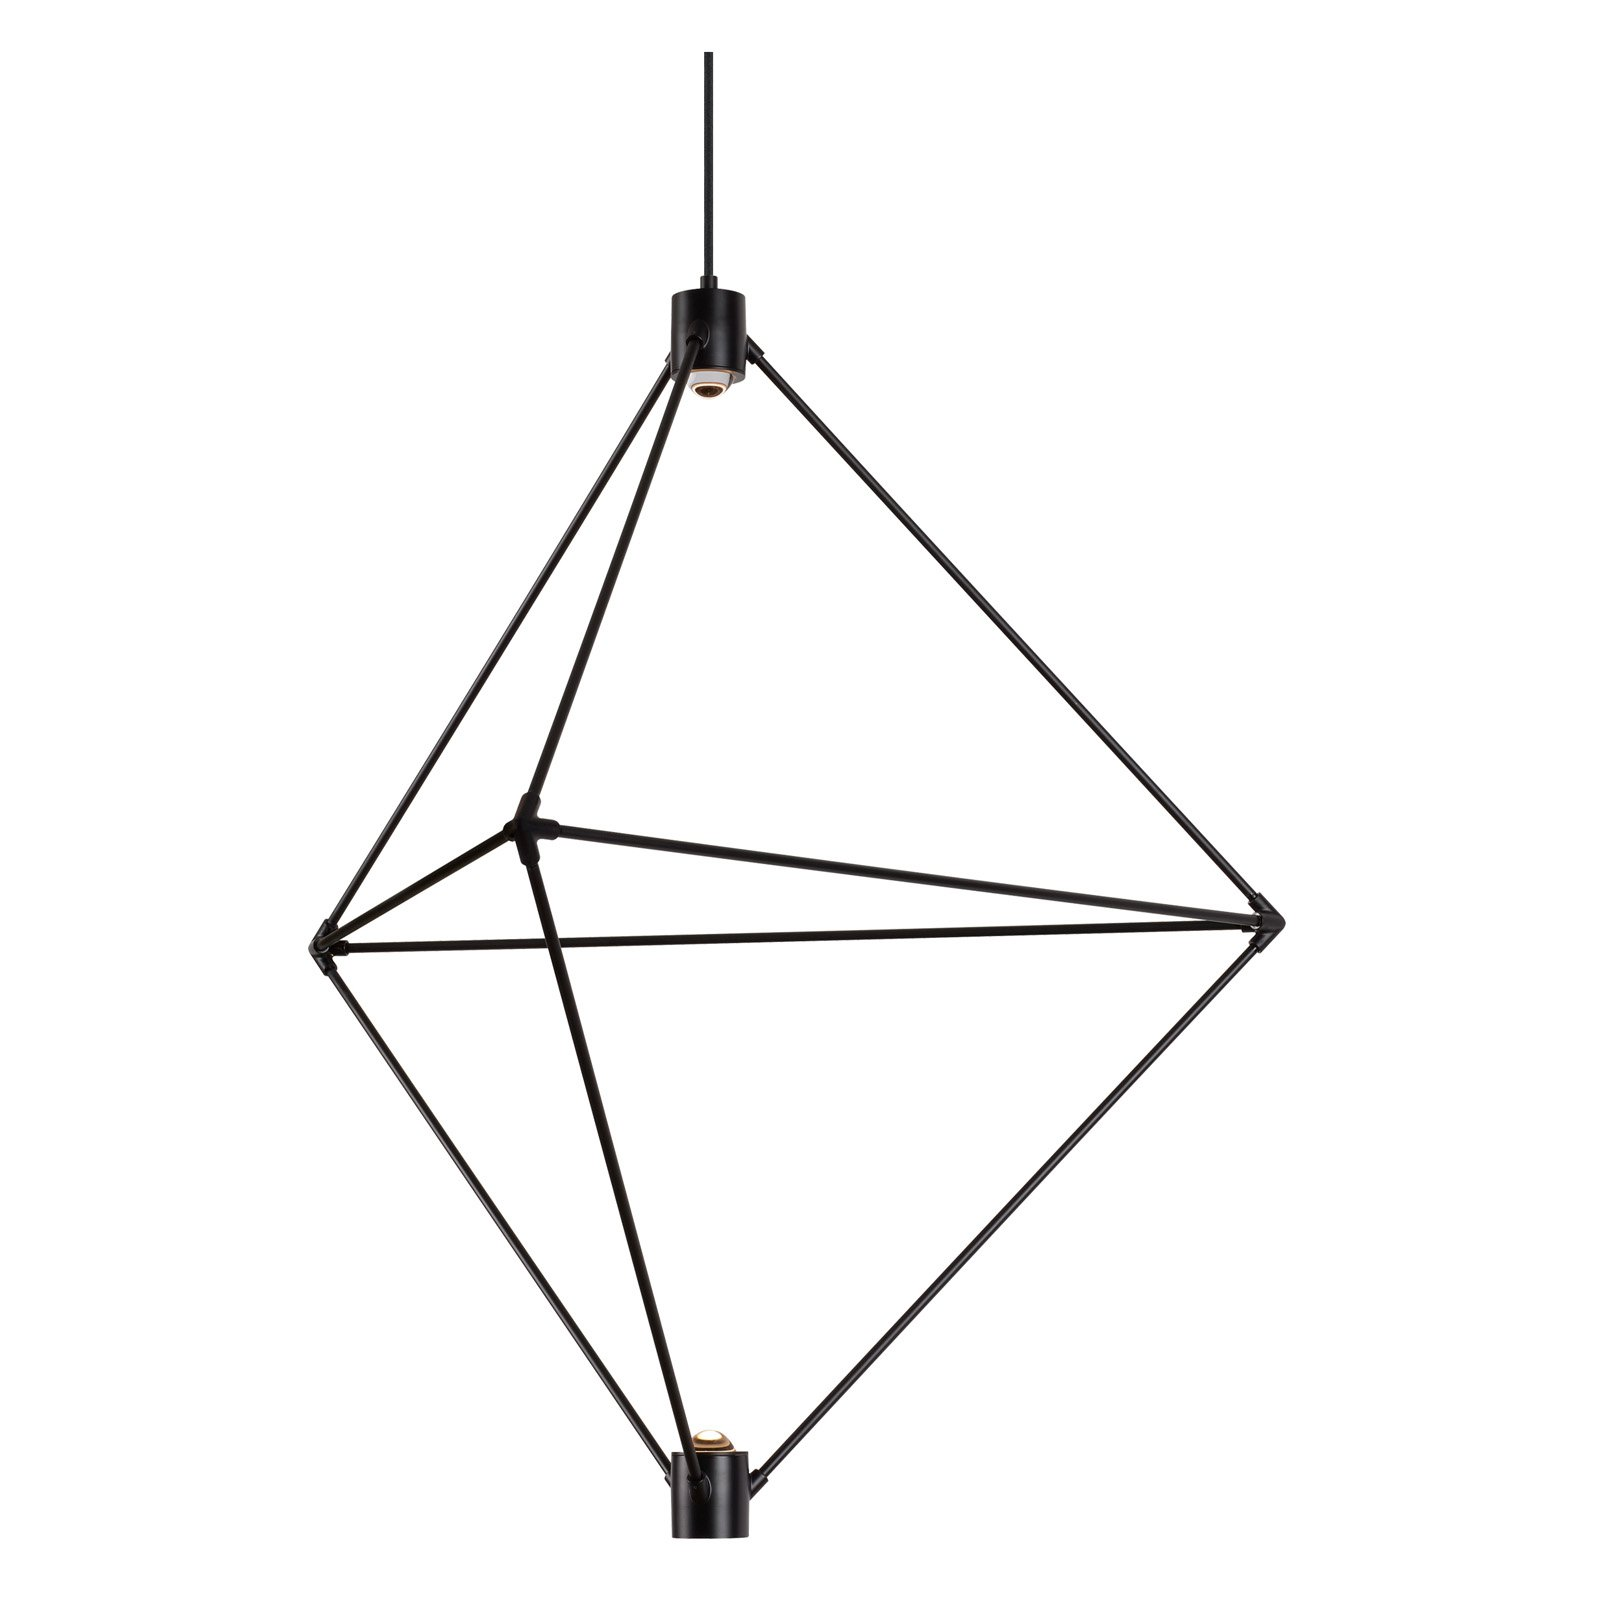 Lbl Lighting Candora CH948 Pendant Light